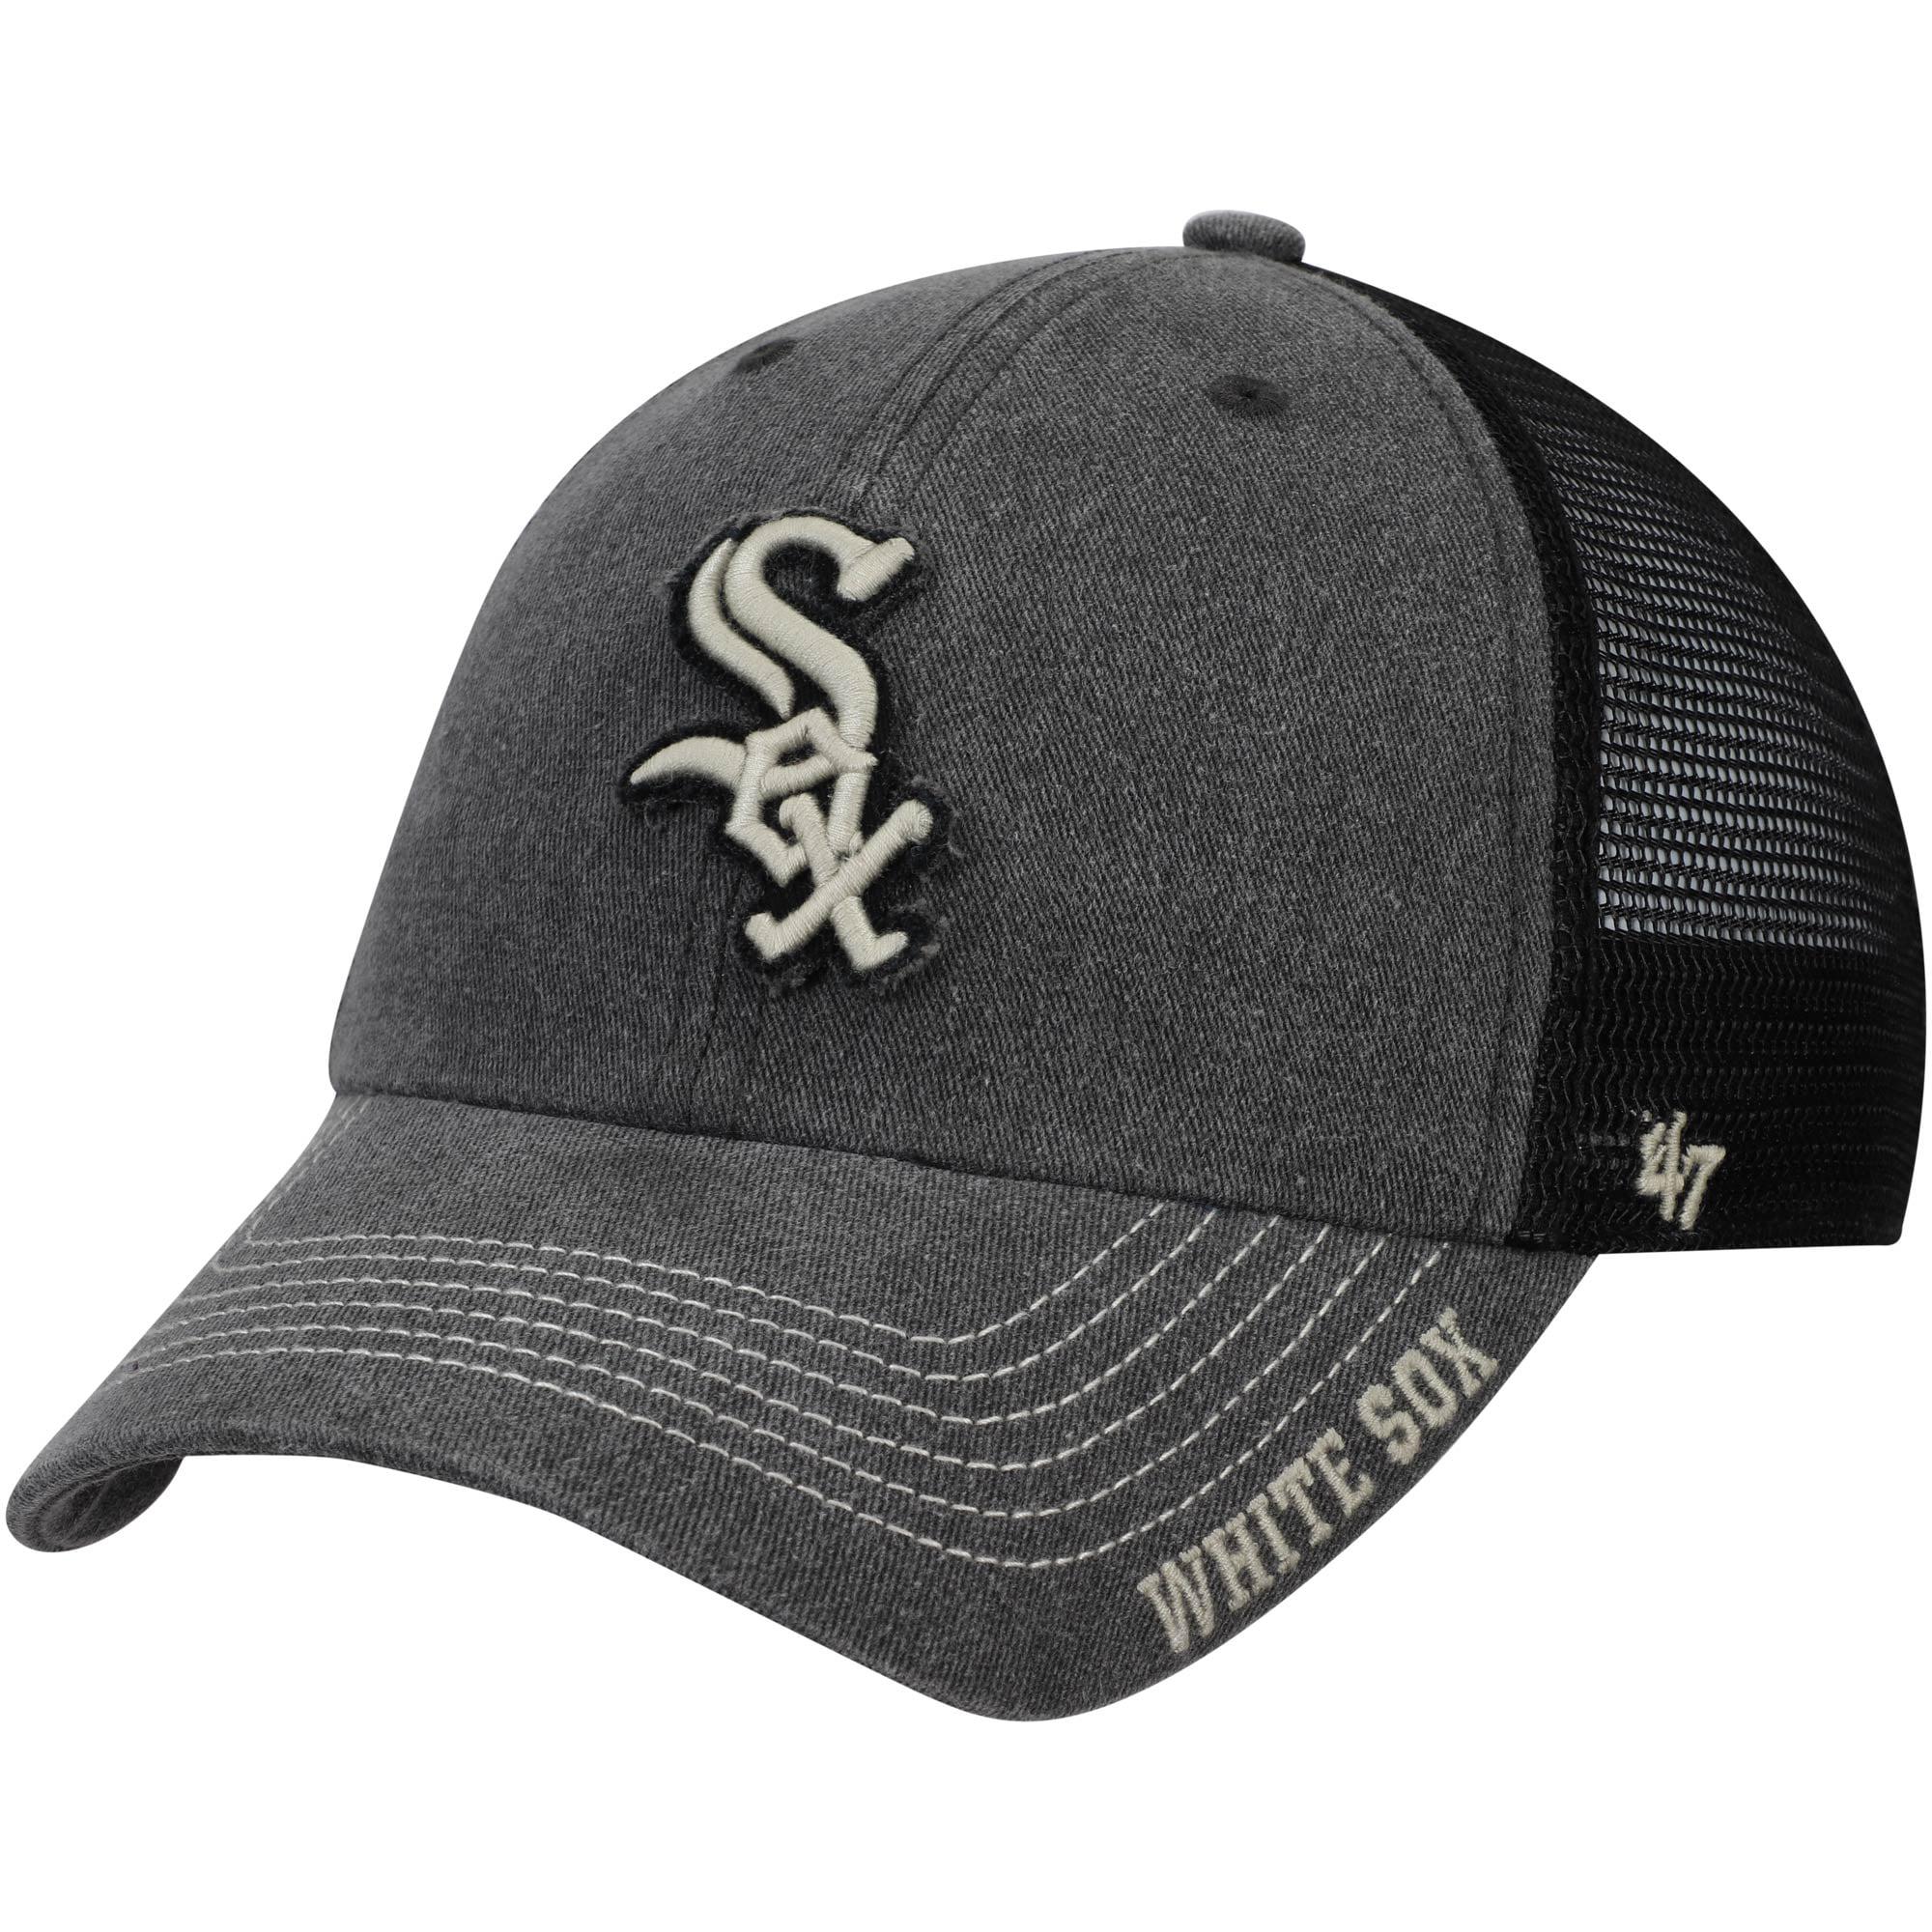 Chicago White Sox '47 Burnstead Clean Up Trucker Adjustable Hat - Black - OSFA